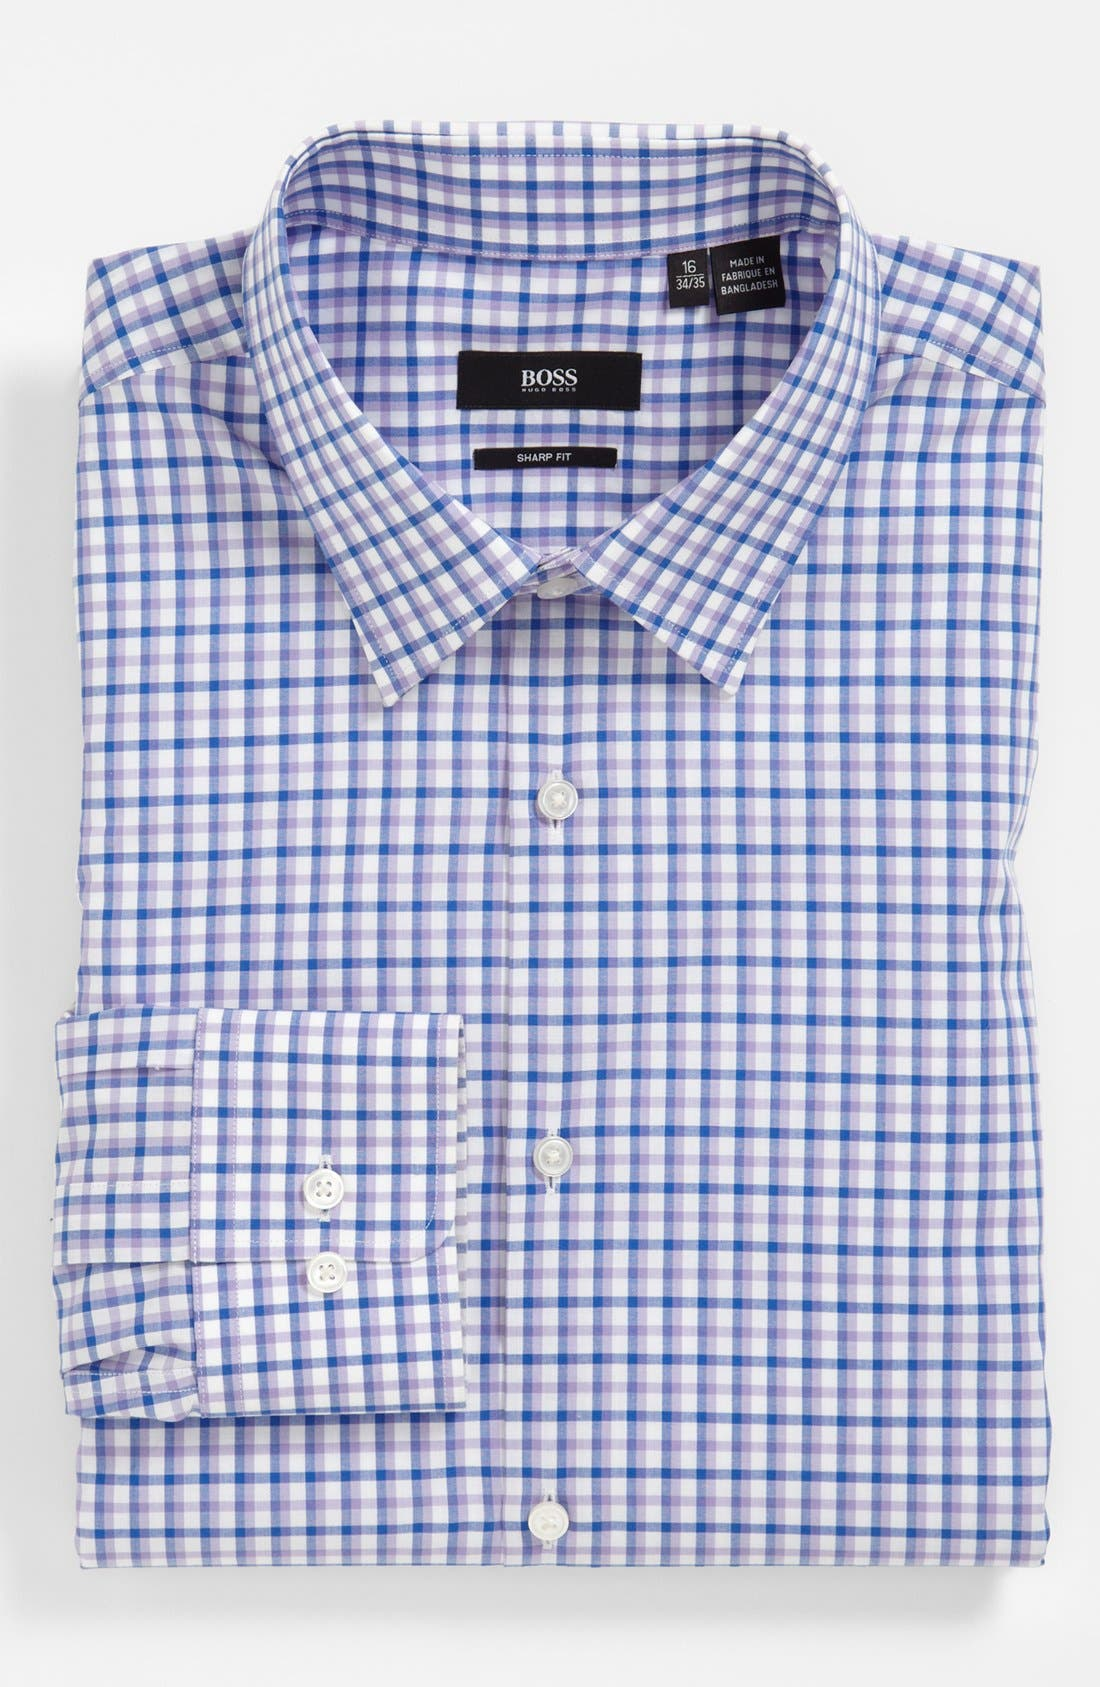 Alternate Image 1 Selected - BOSS HUGO BOSS 'Marlow' Sharp Fit Dress Shirt